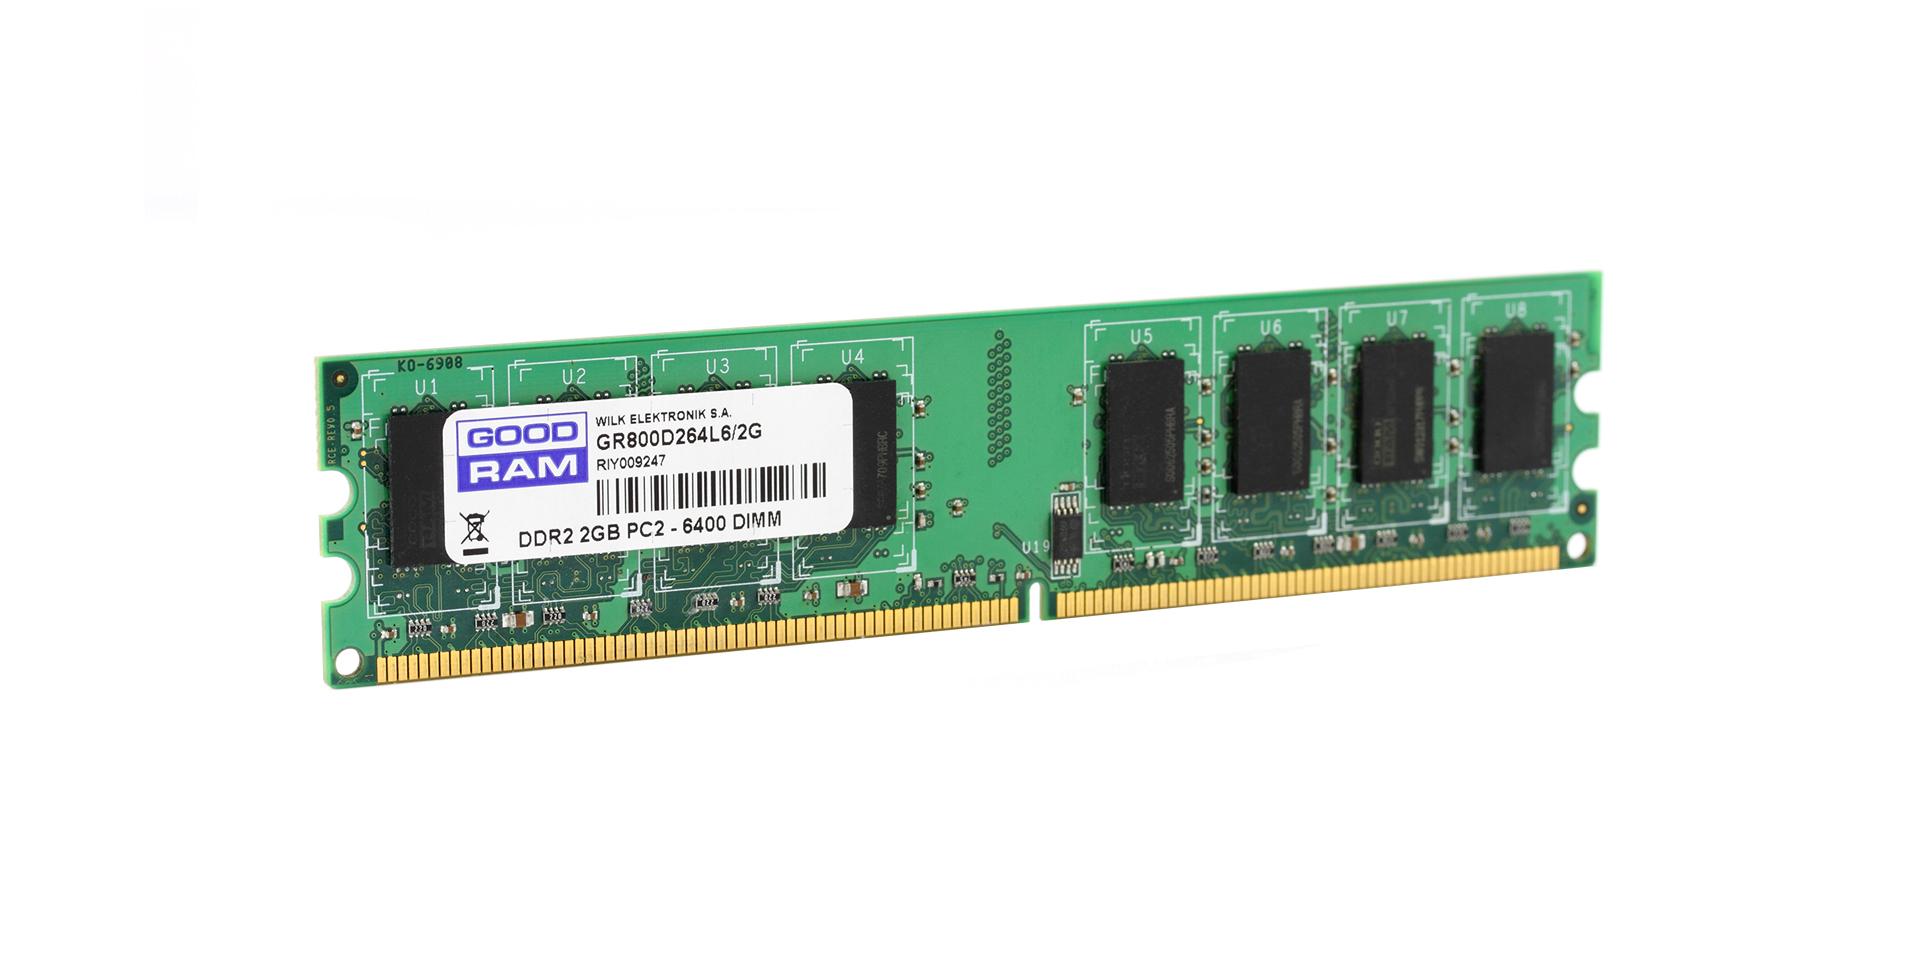 DDR2 memory module